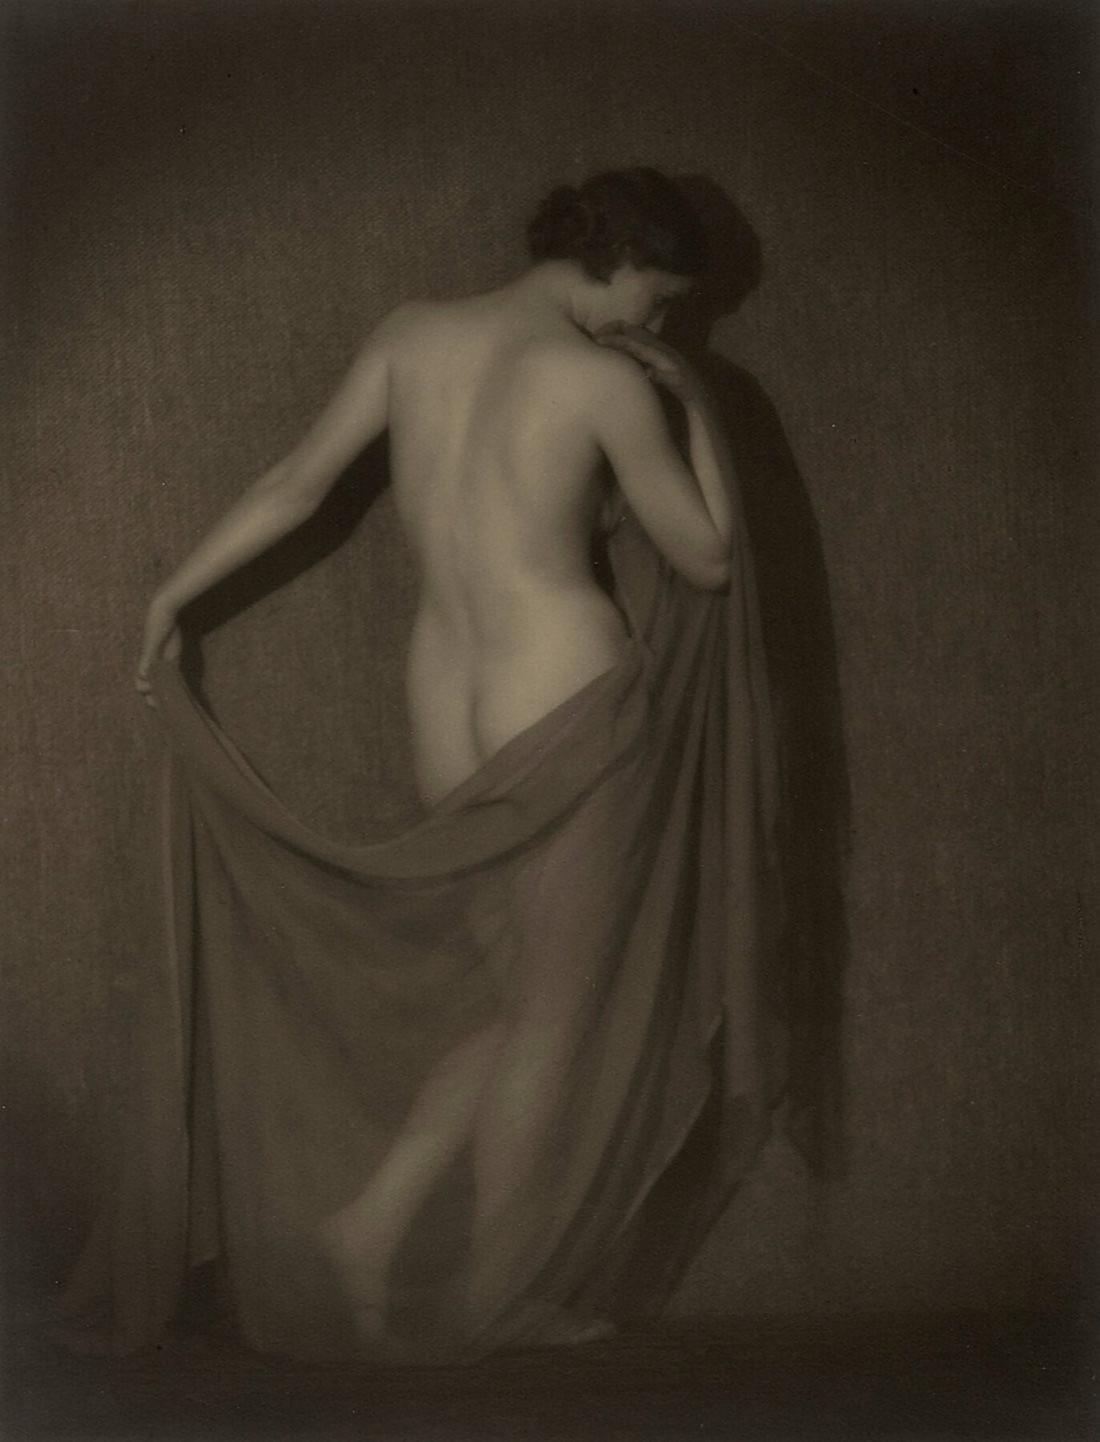 Waldemar Eide - Aktstudie (Ellen Sinding-maybe), 1926_e